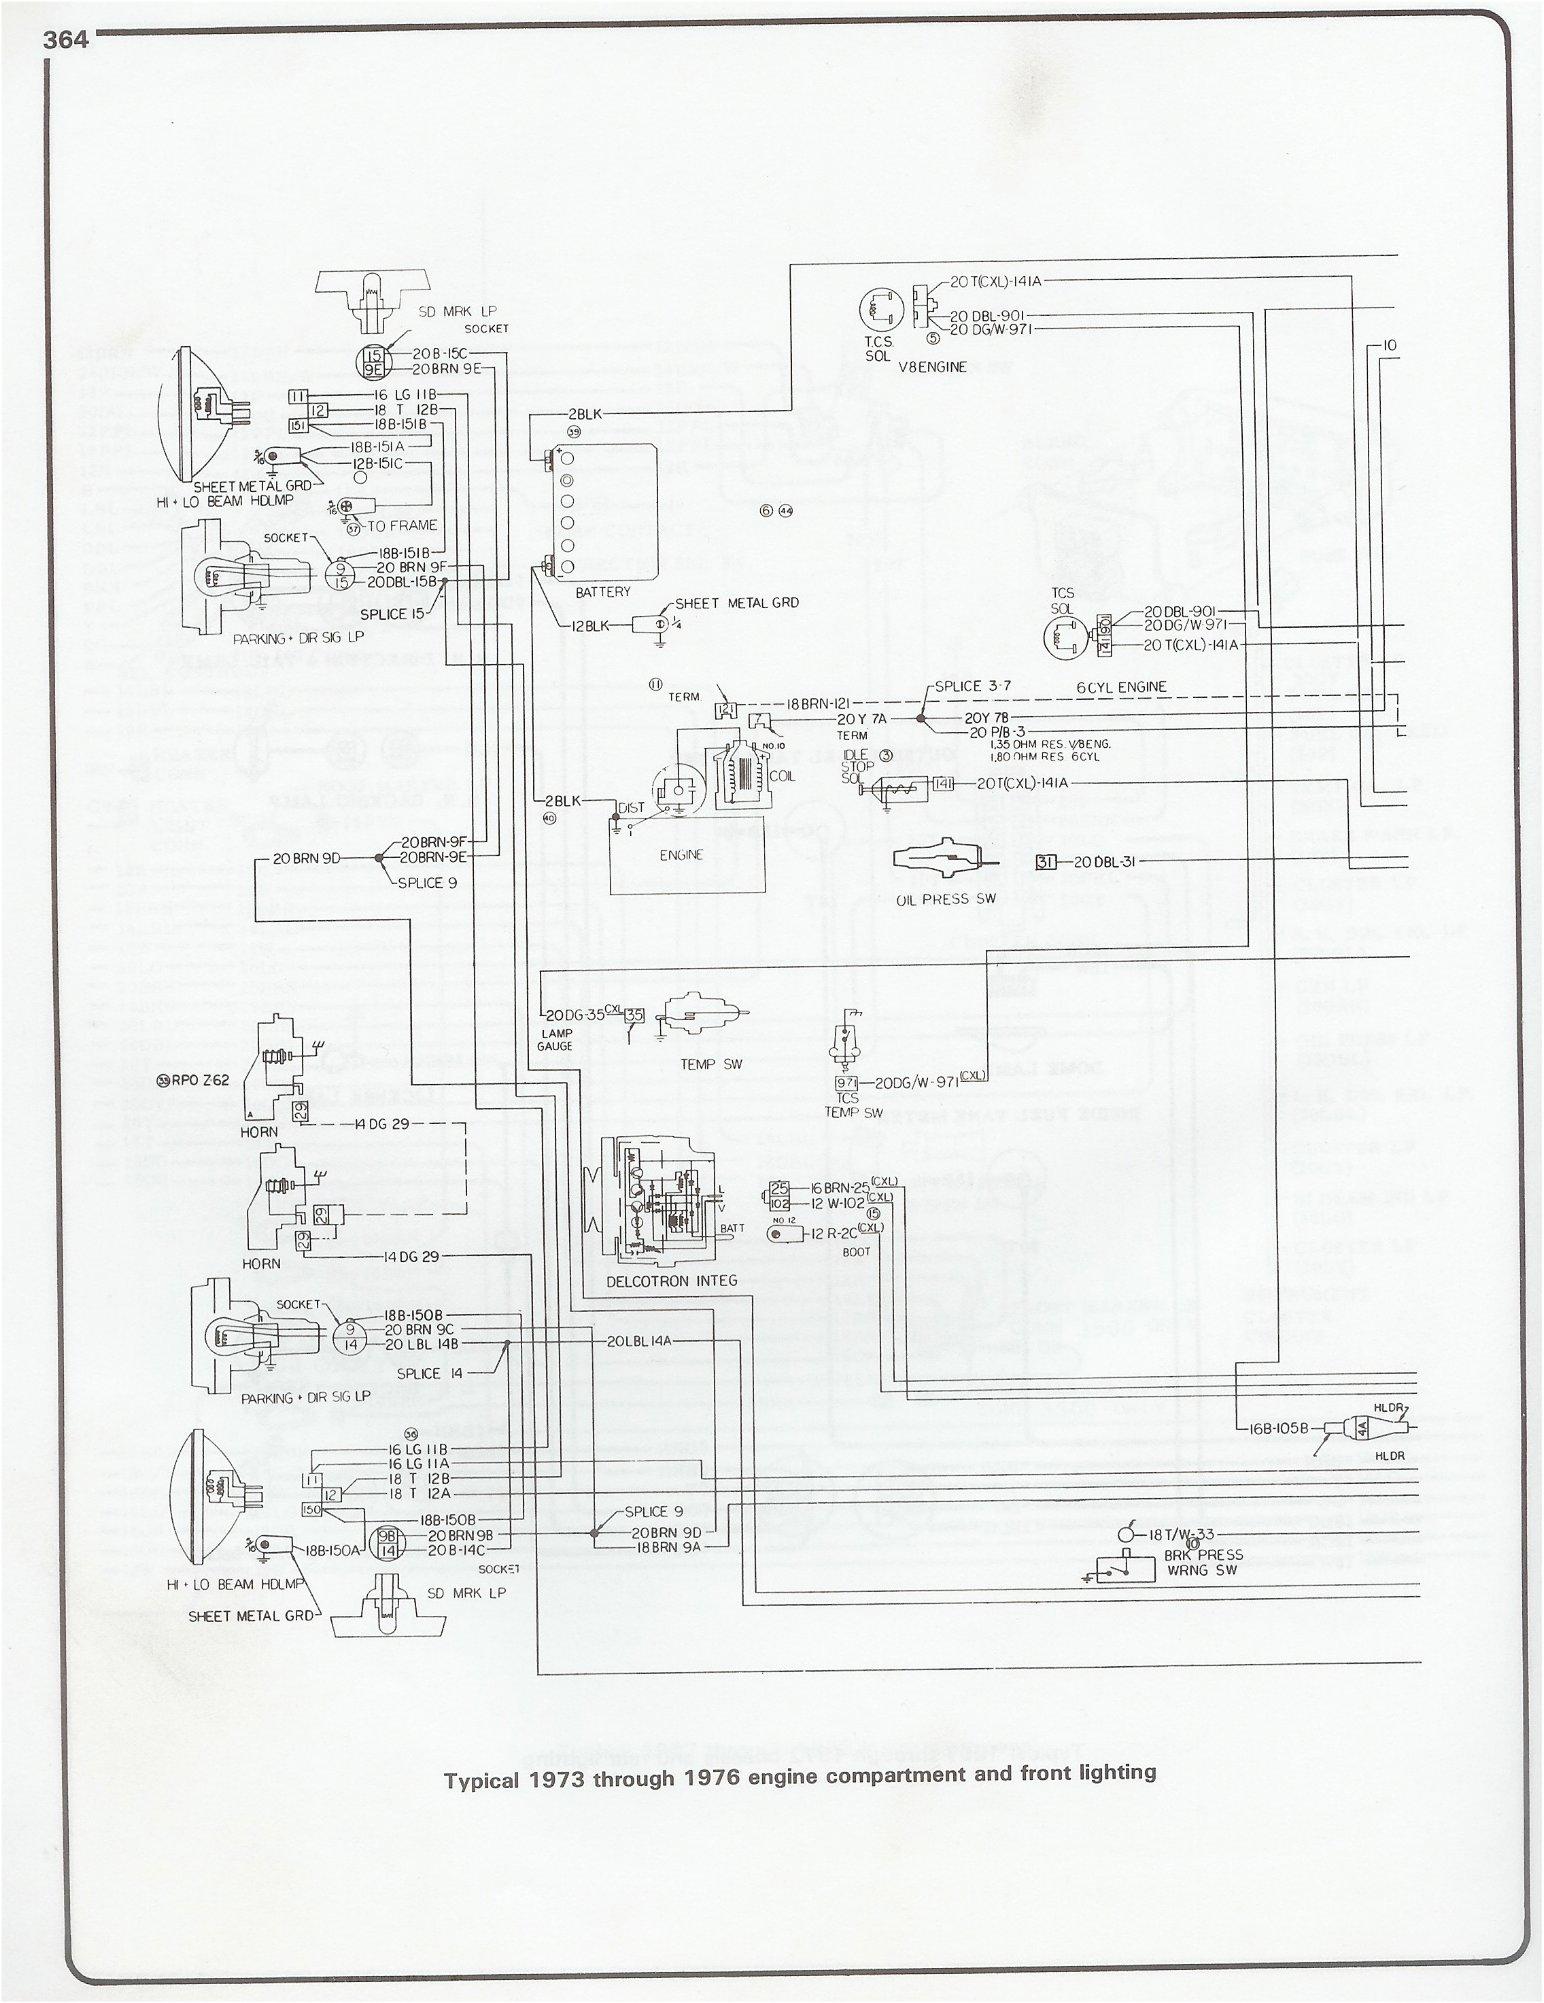 1 8T Fuse Diagram   Wiring Library - 2004 Silverado Bose Amp Wiring Diagram